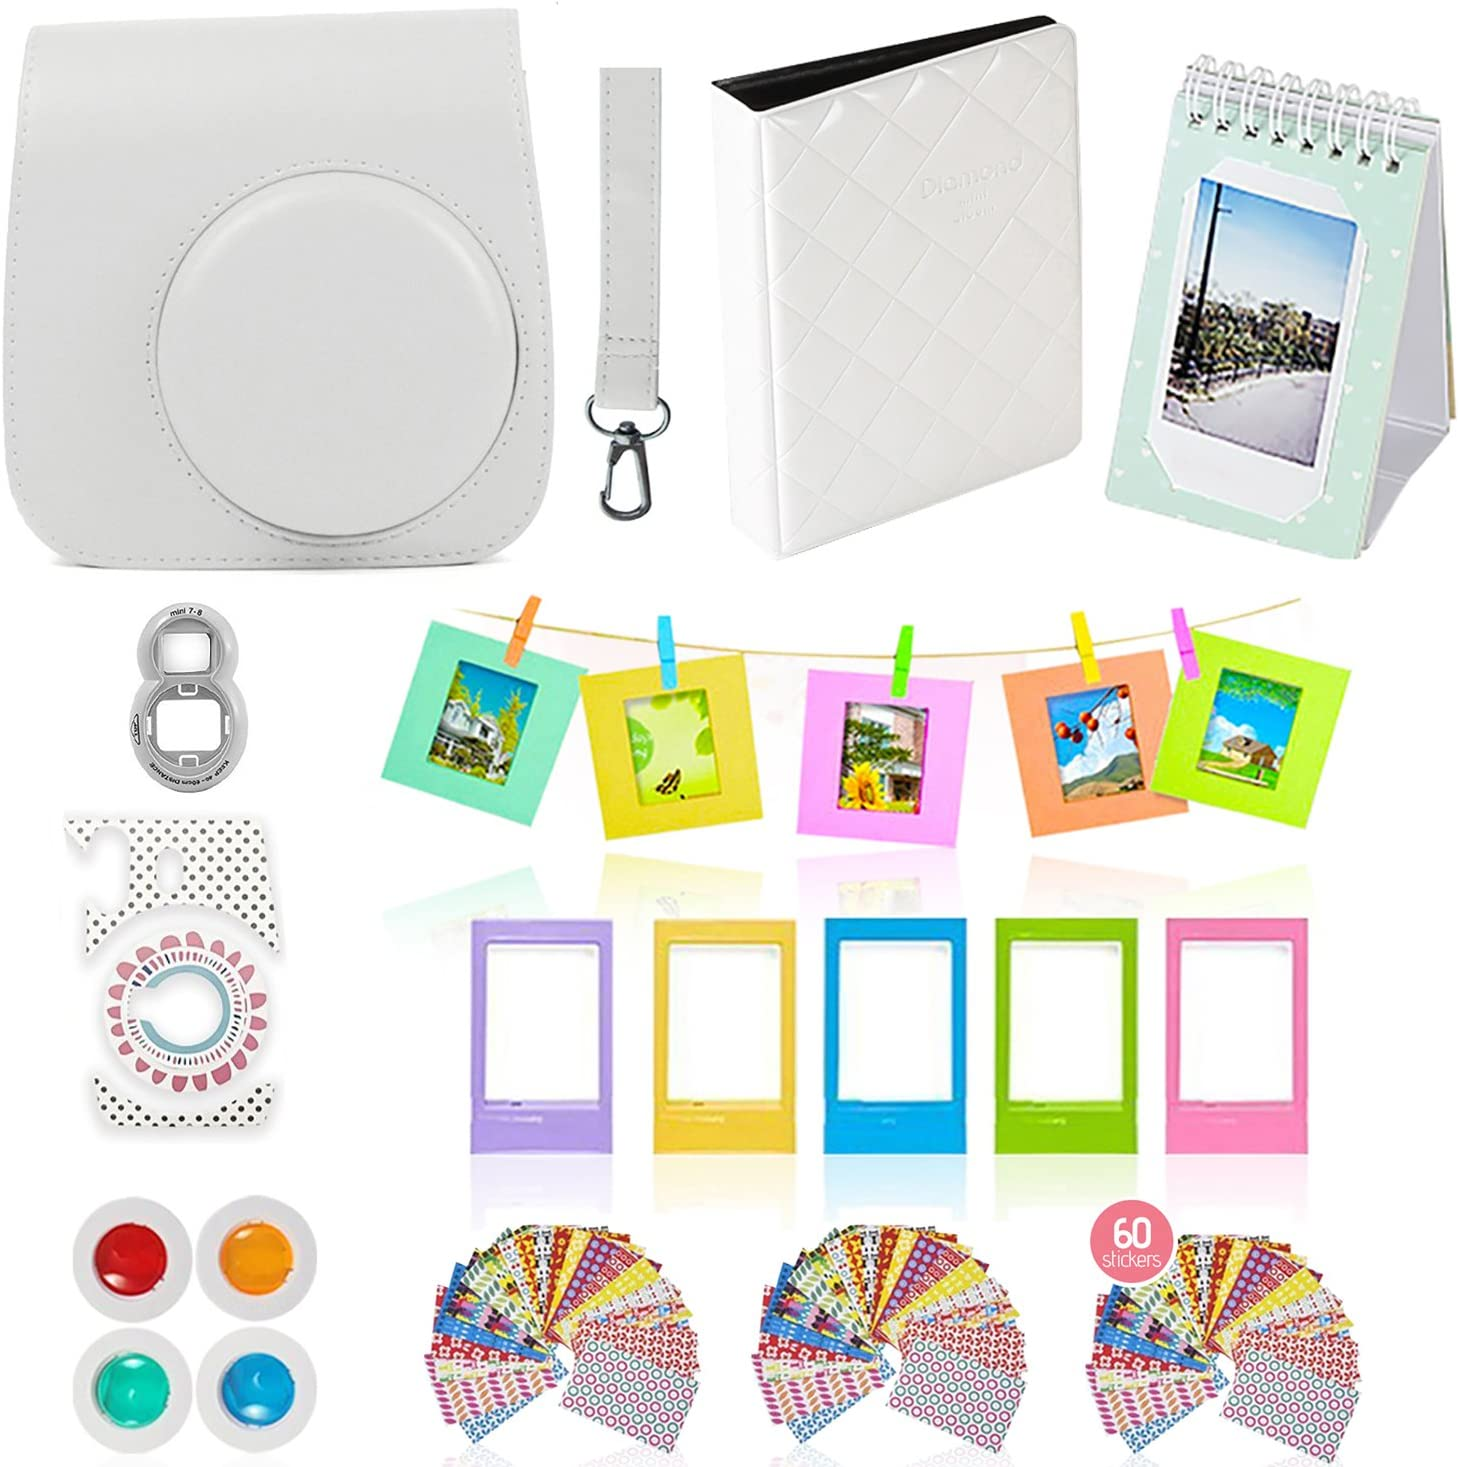 for Fujifilm Instax Mini 8 9 Camera Accessories Bundle Set Camera Case, instax Mini Album, Film Stickers, Color Filter, Photo Frame, Seflie Lens -Rainbow Mist